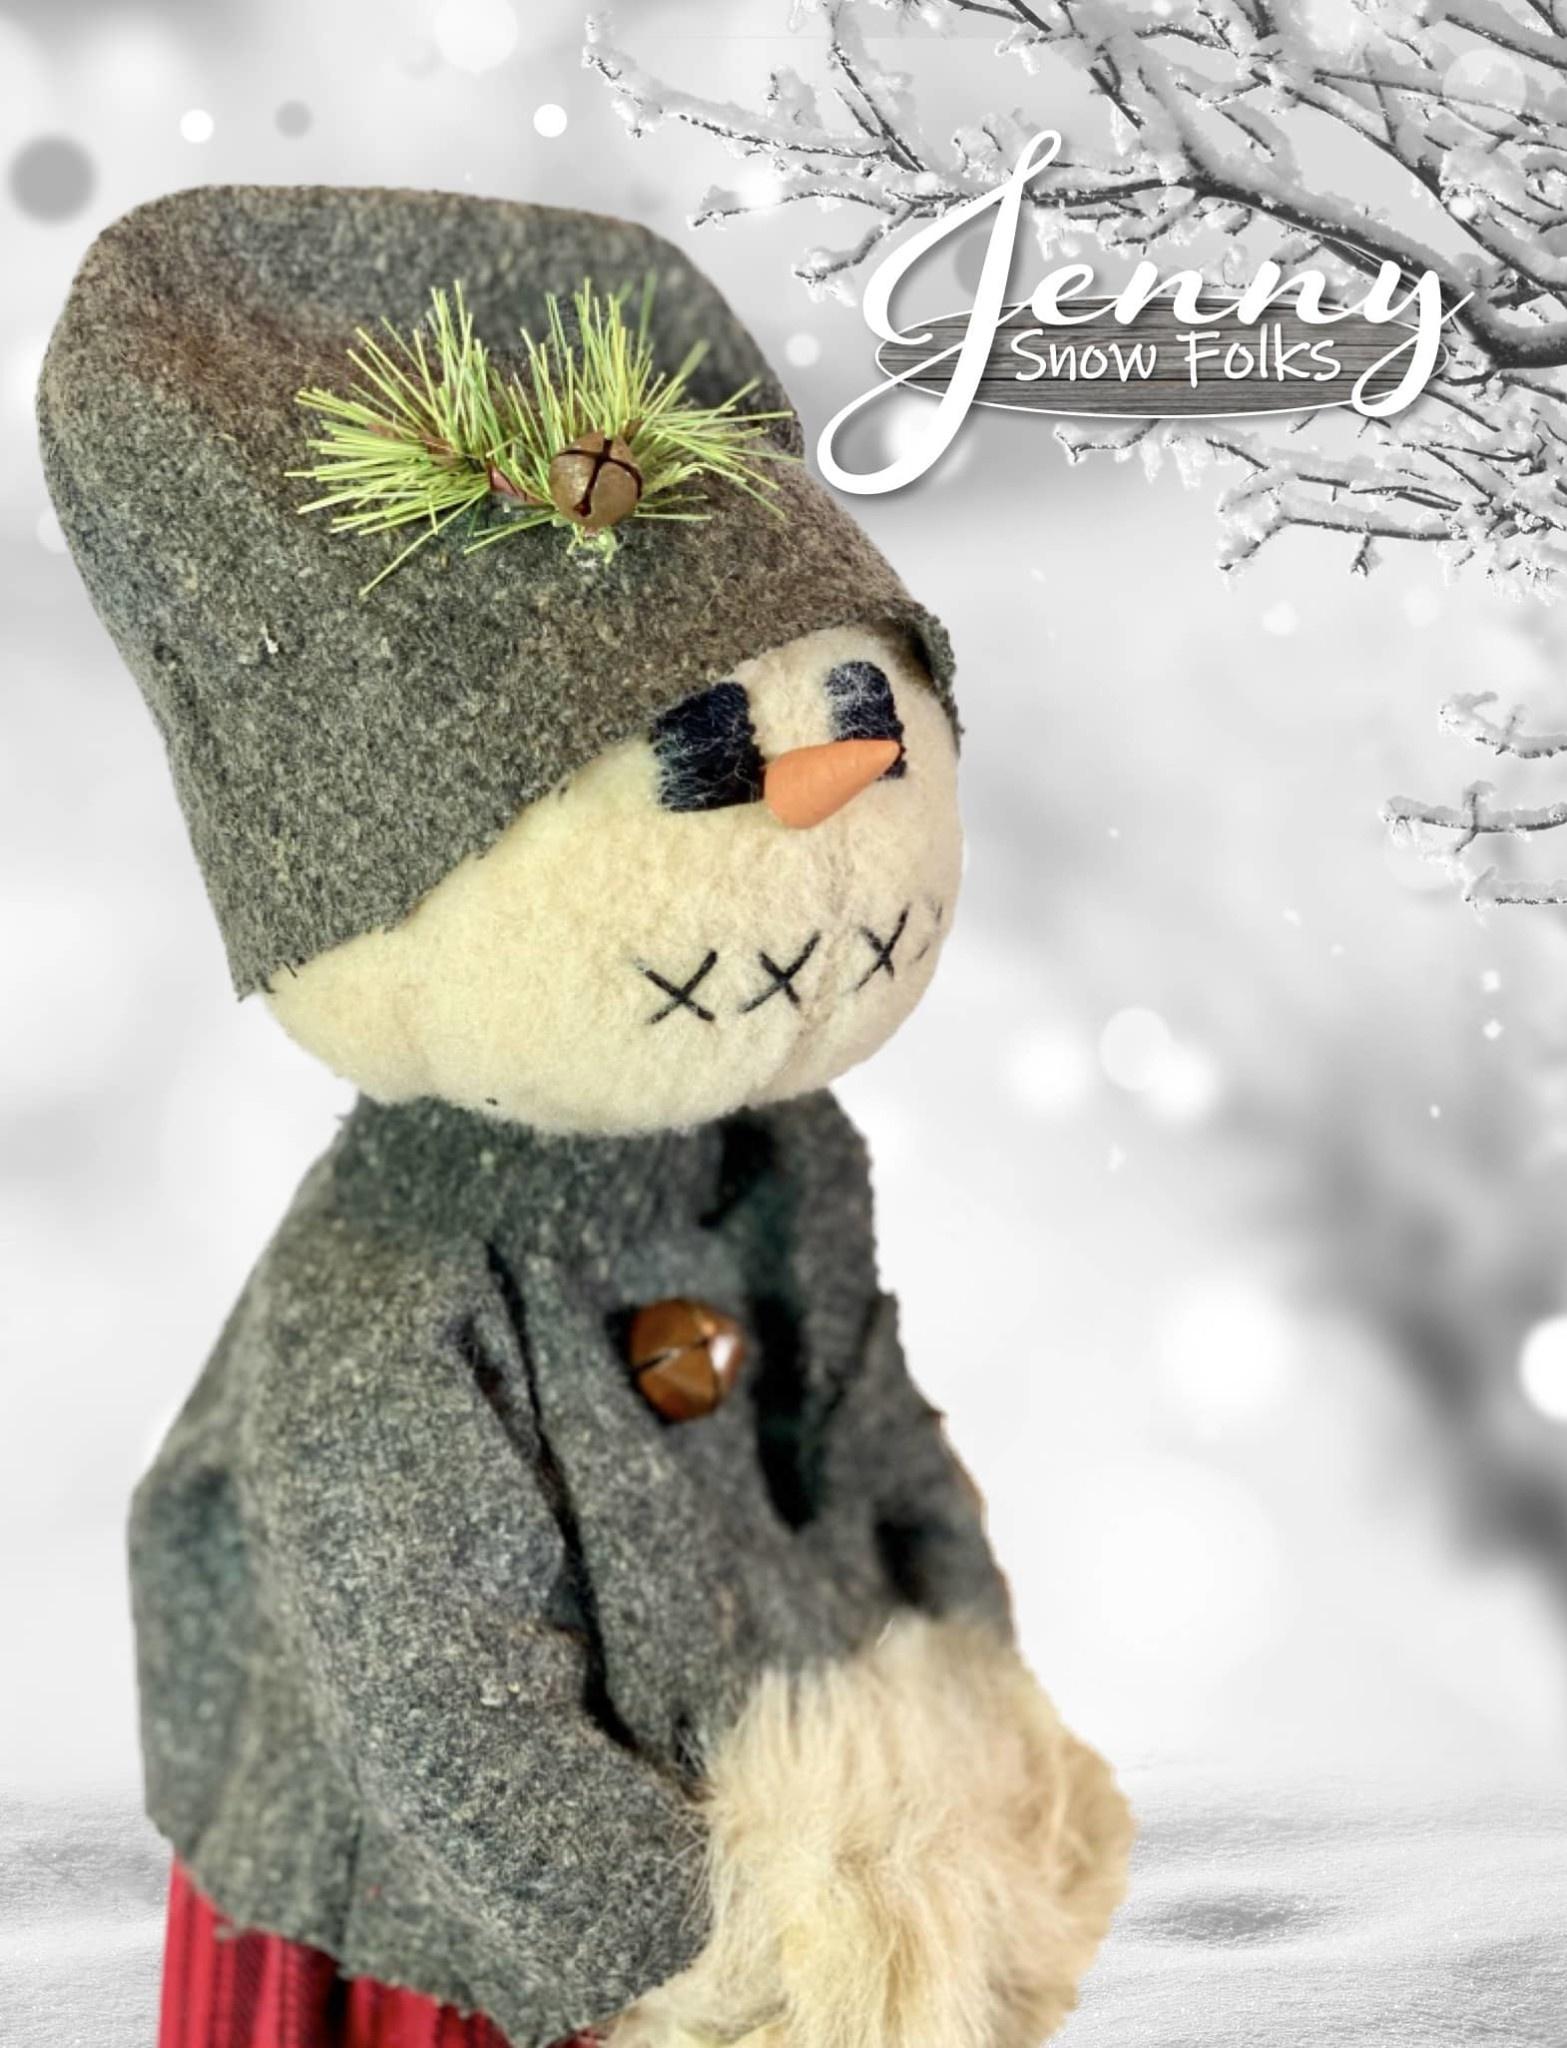 Nana's Farmhouse Jenny Snow Girl Grey Sweater Holding Hand Muffs